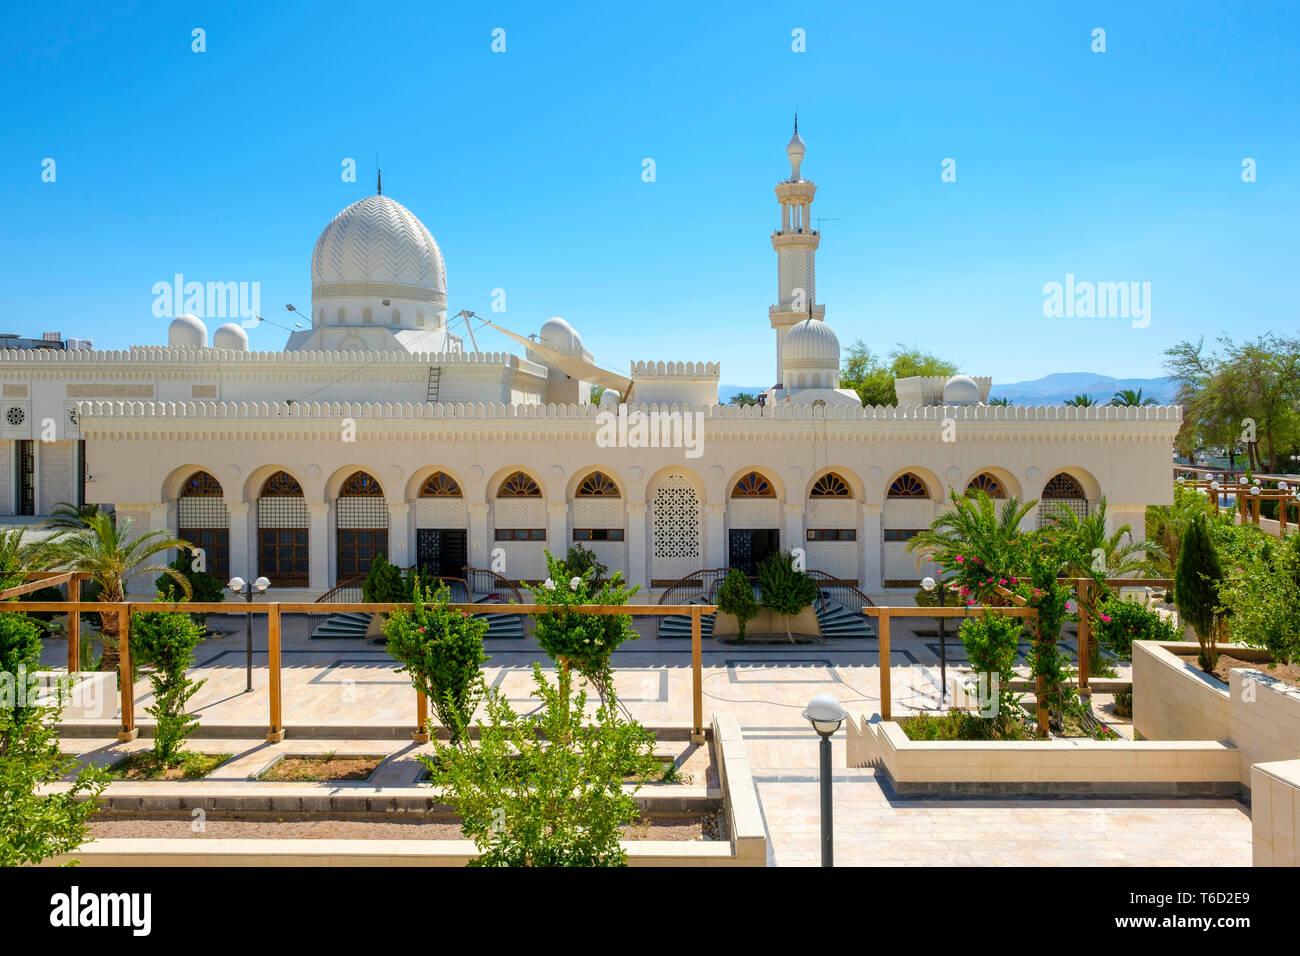 Jordan, Aqaba Governorate, Aqaba. Sharif Hussein bin Ali Mosque. - Stock Image